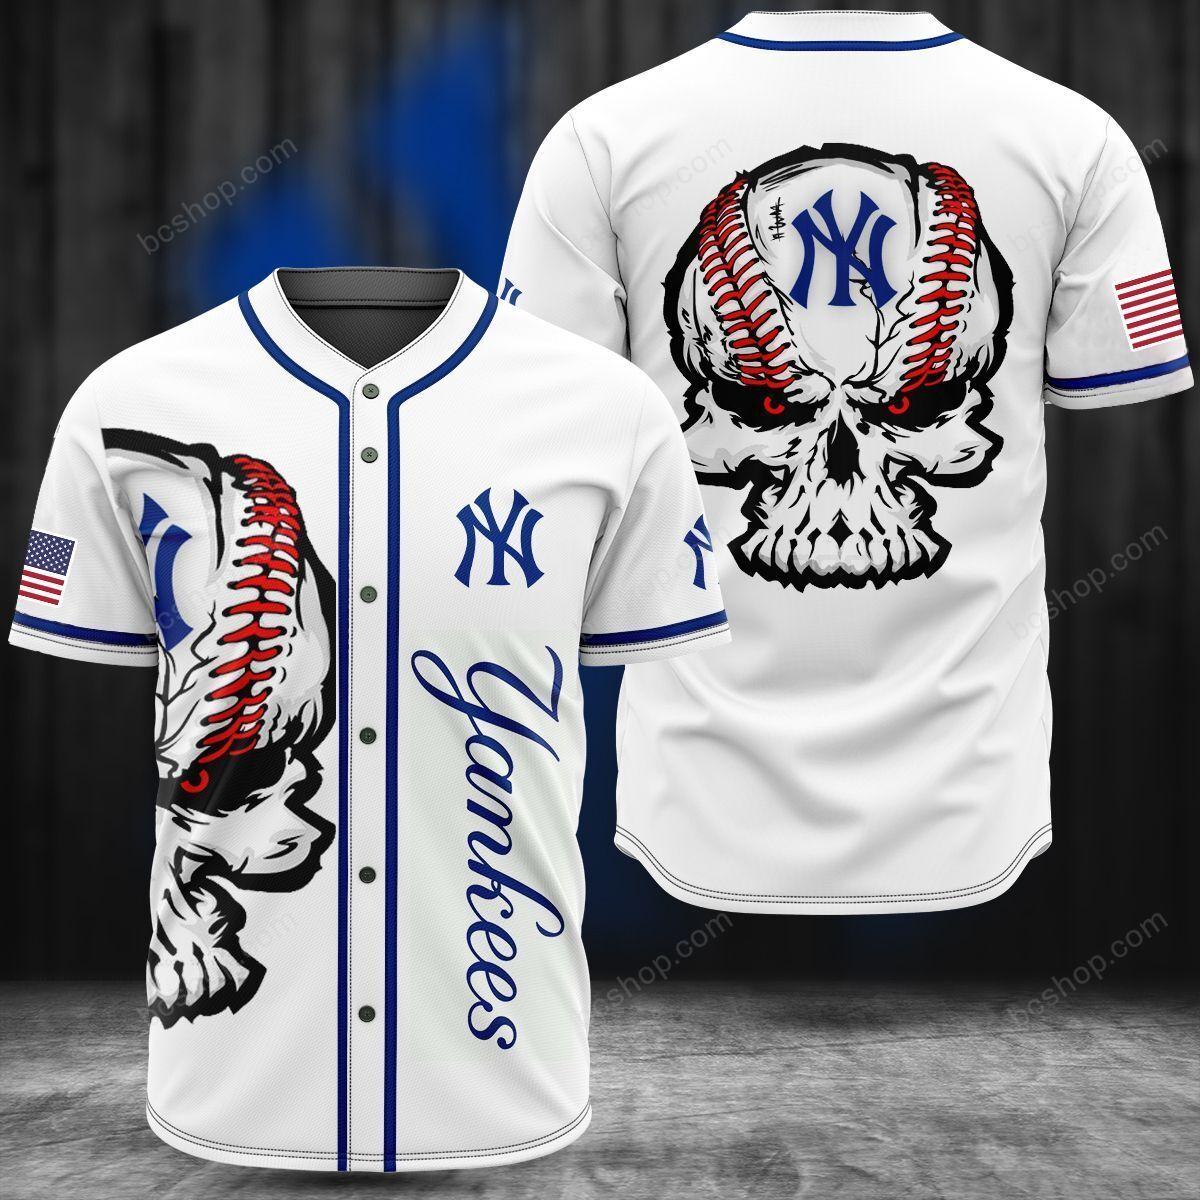 New York Yankees Skull white baseball Jersey shirt